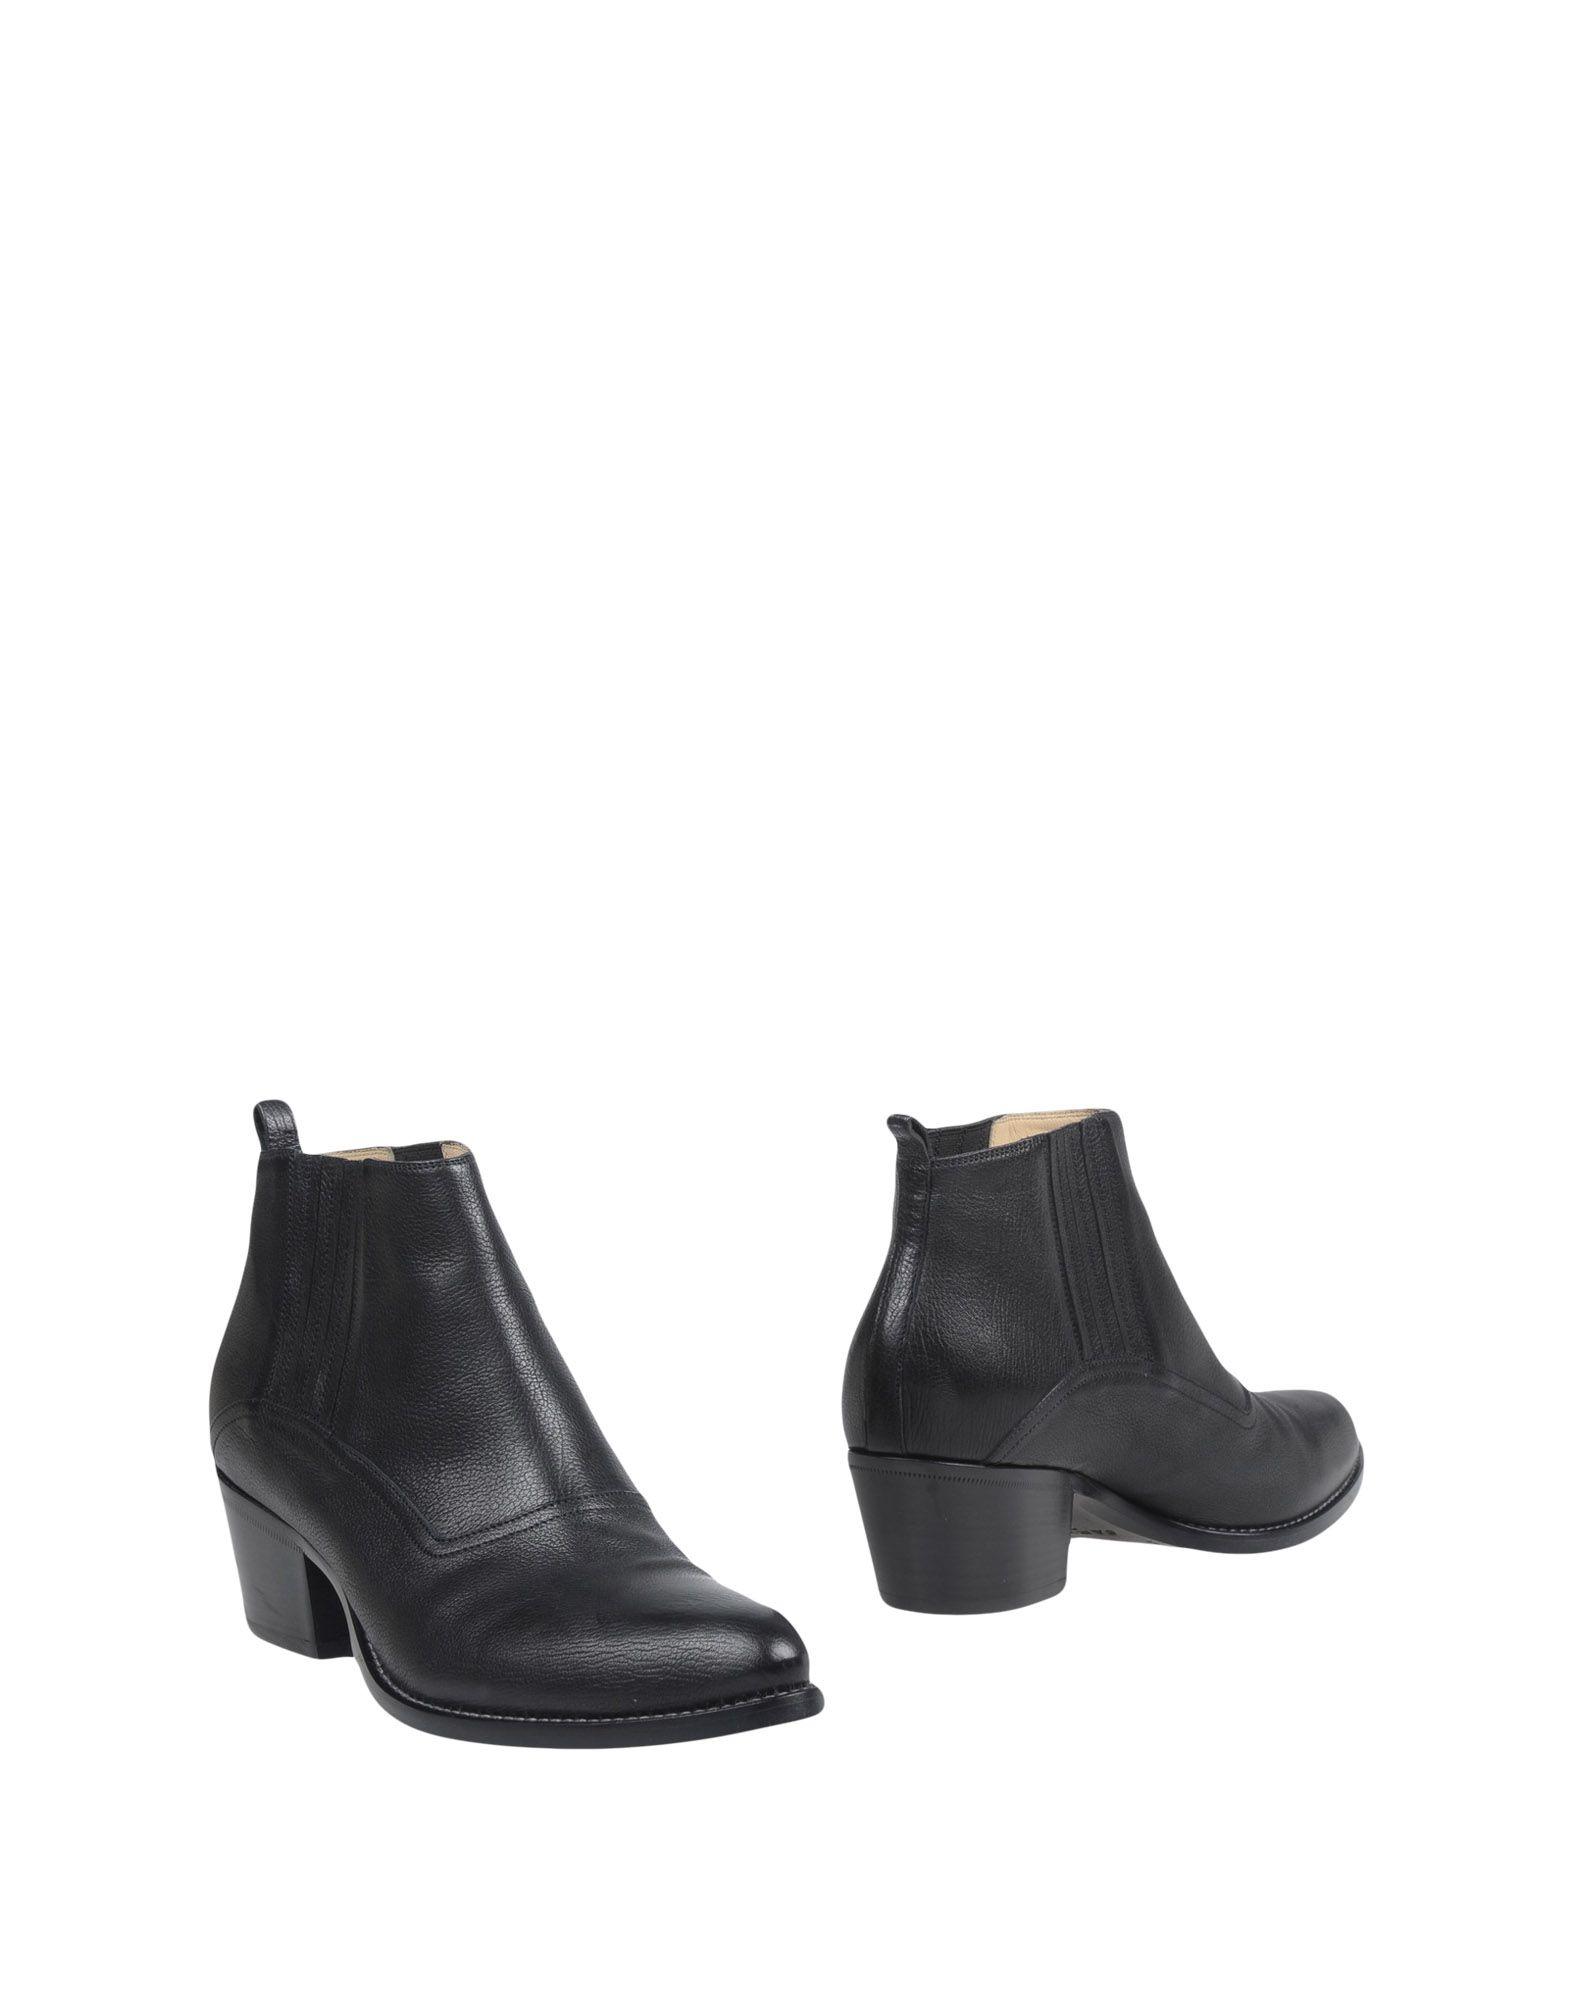 SARTORE Полусапоги и высокие ботинки maliparmi полусапоги и высокие ботинки